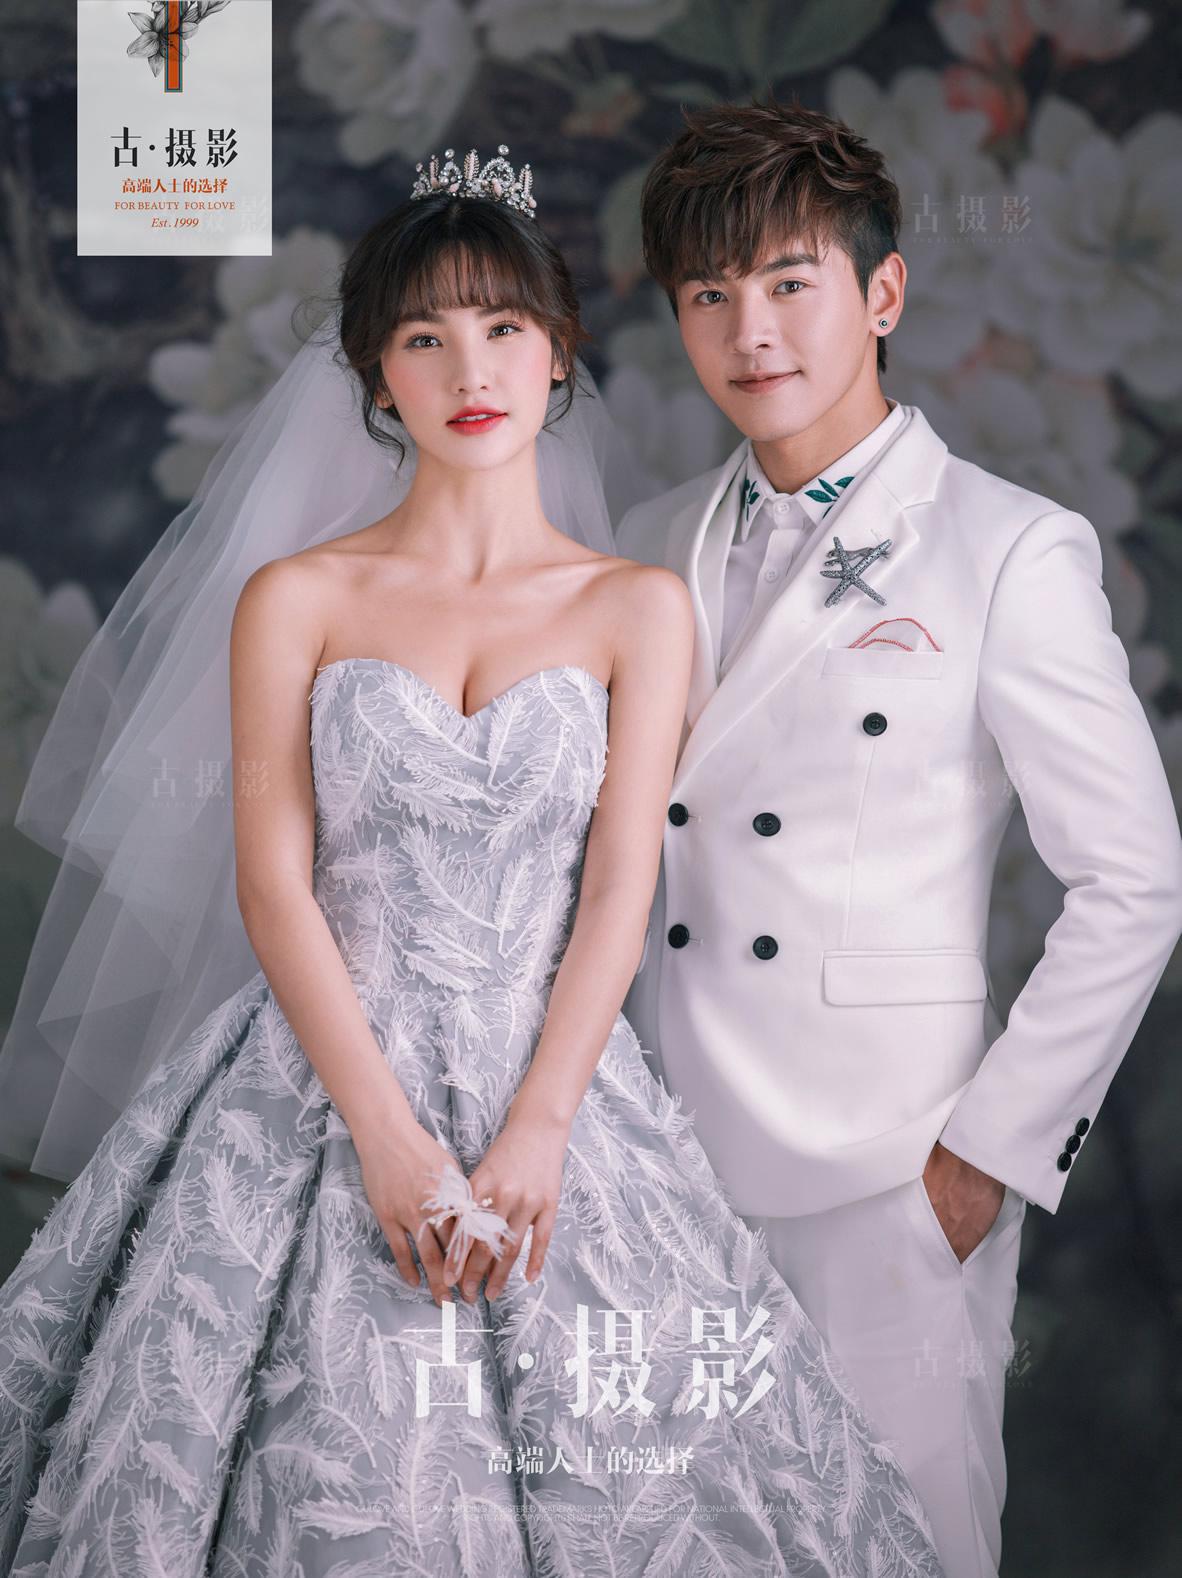 GRACE Ⅱ - 明星范 - 古摄影婚纱艺术-古摄影成都婚纱摄影艺术摄影网